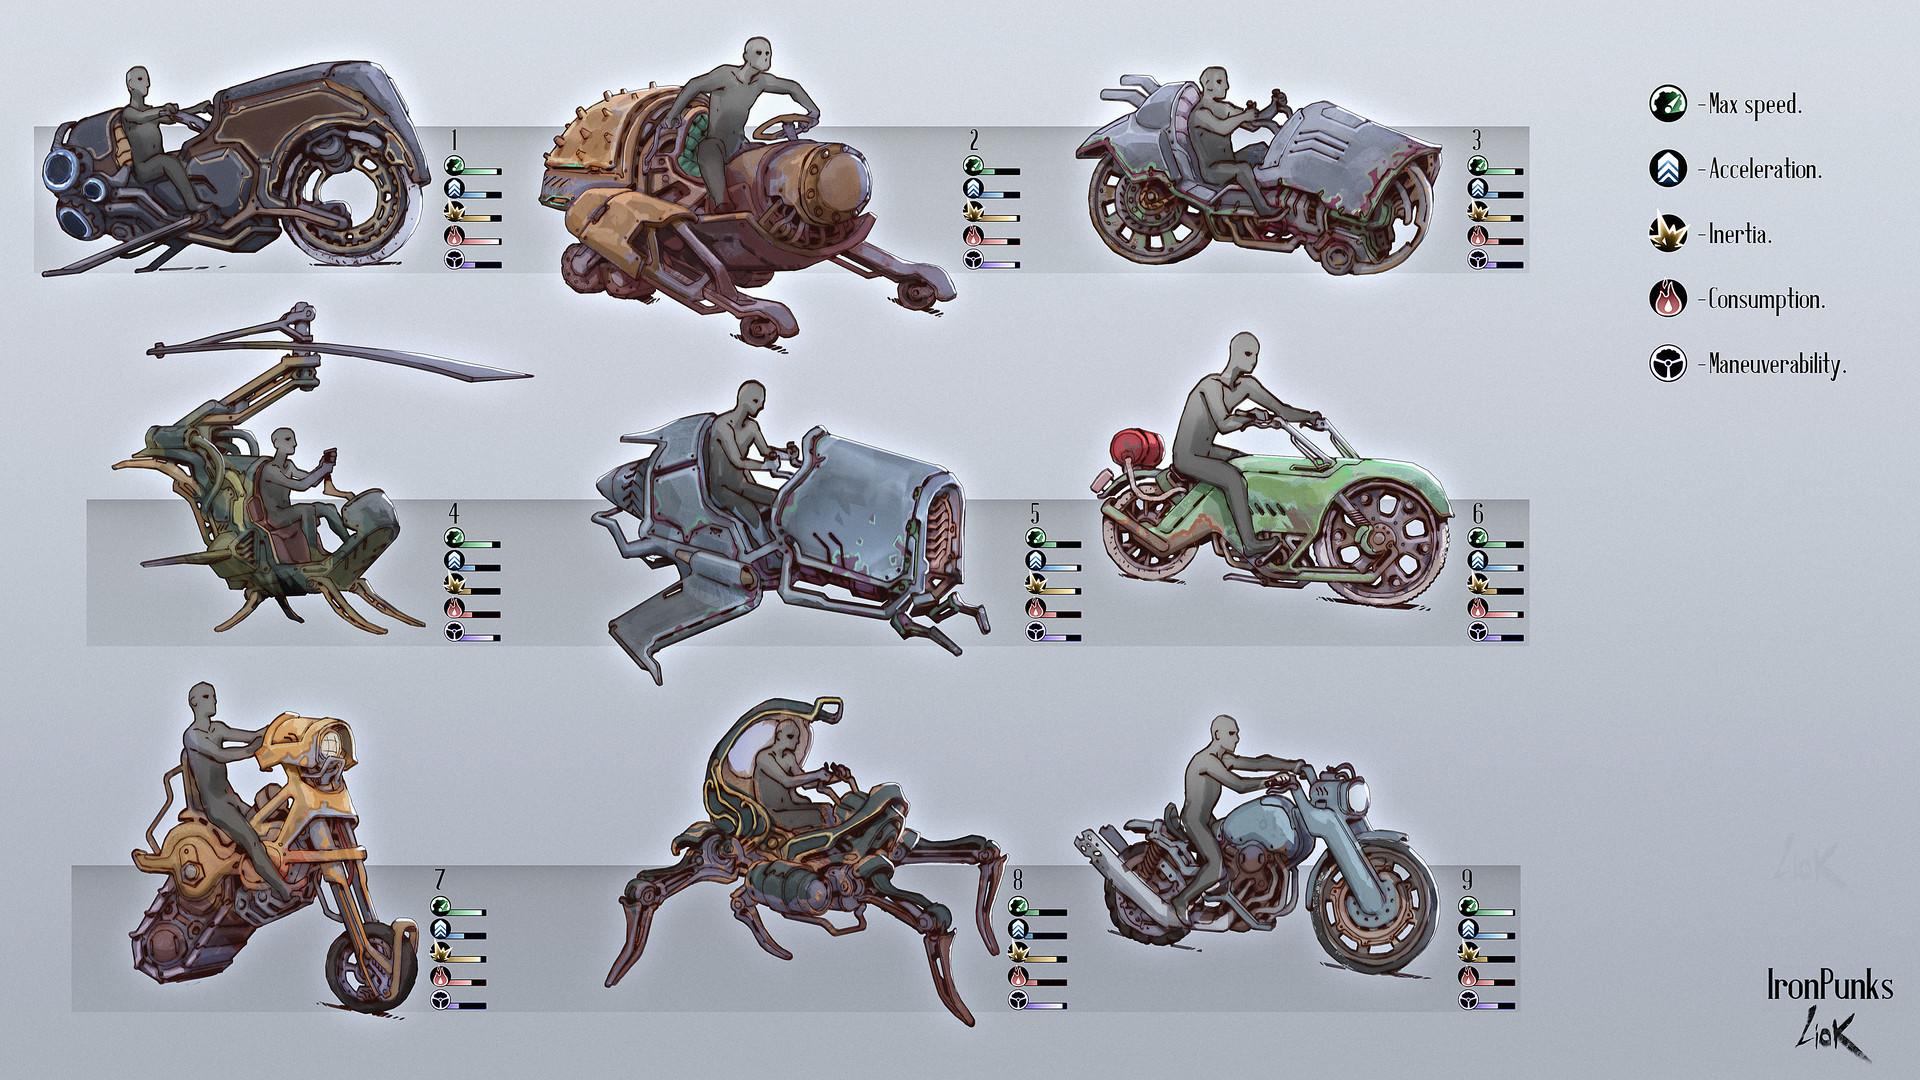 Loic liok bramoulle ironpunks bikes